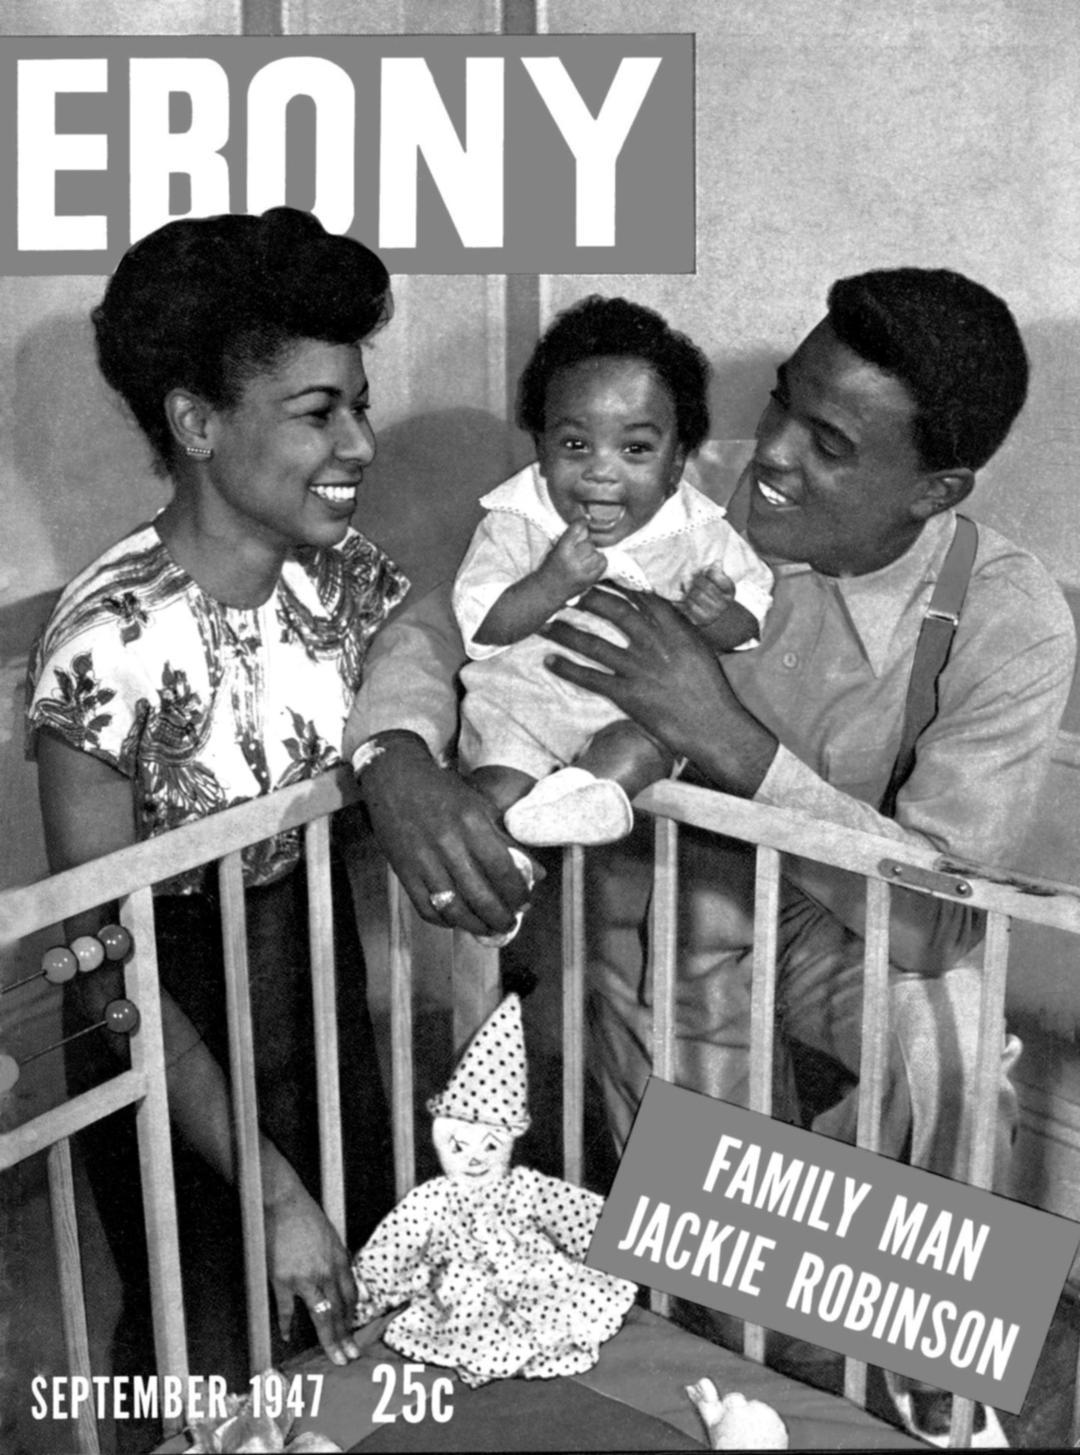 Ebony, September 1947